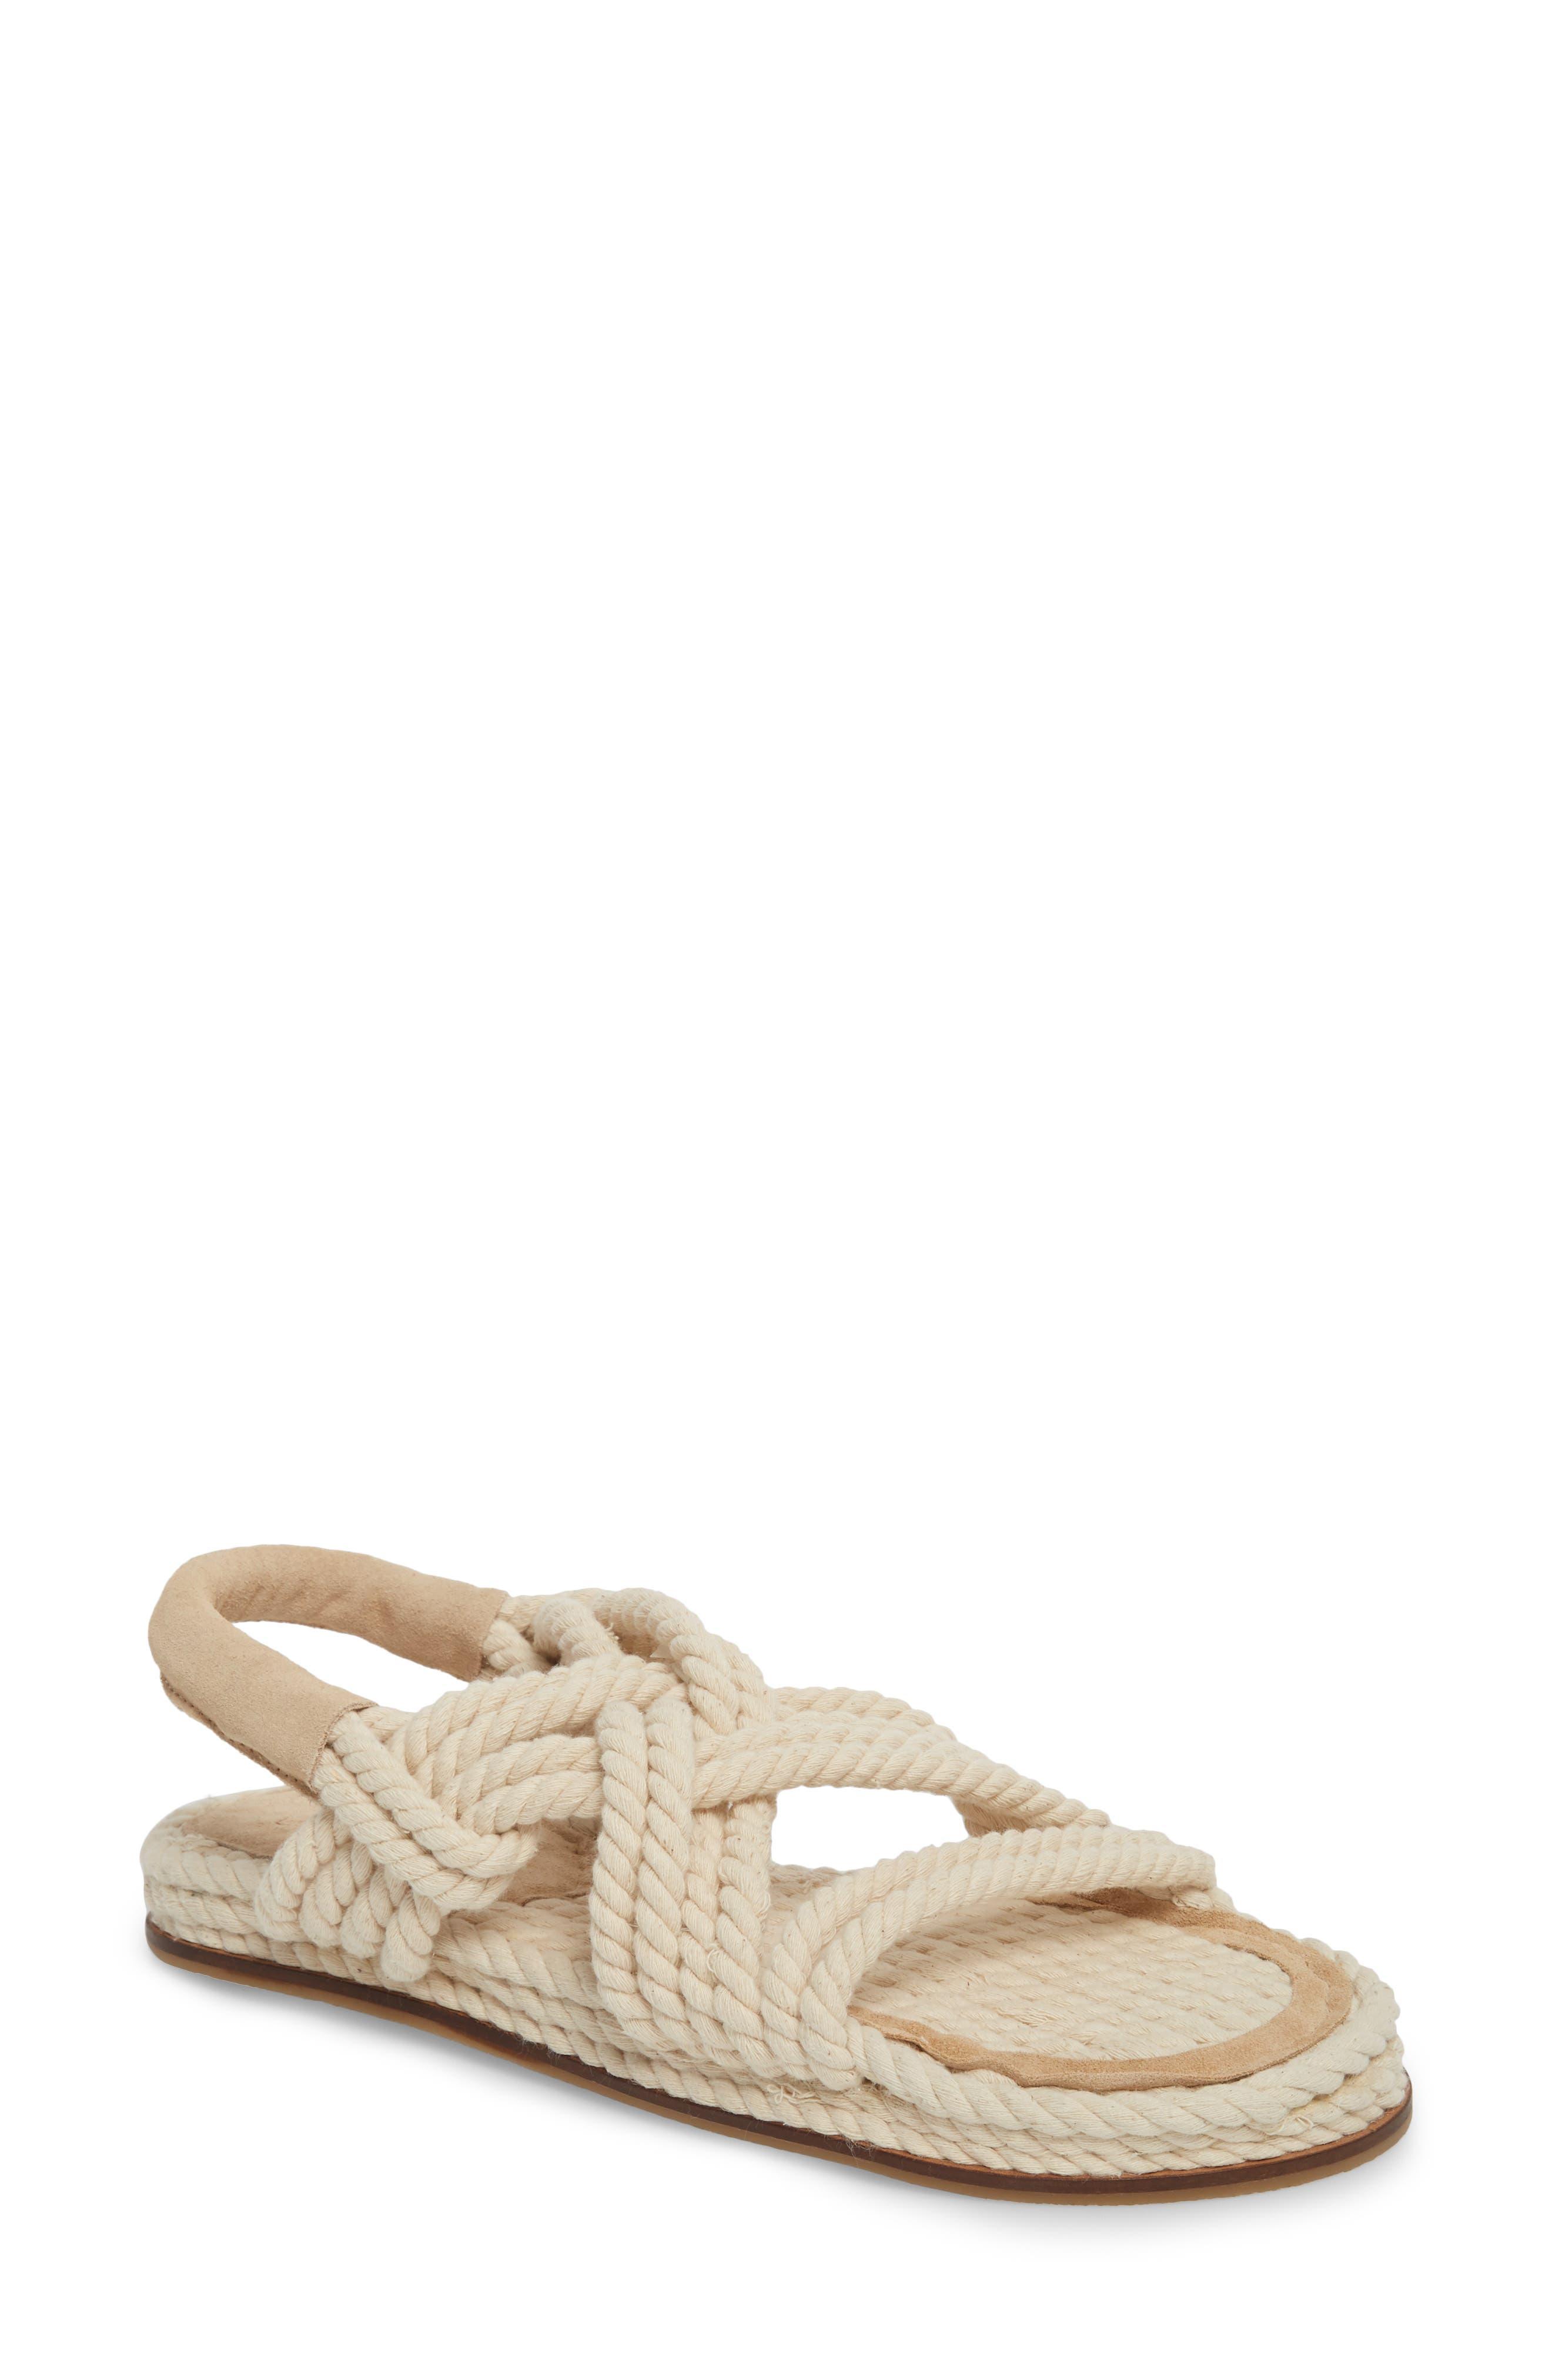 Fiesta Rope Flat Sandal,                             Main thumbnail 1, color,                             Nude